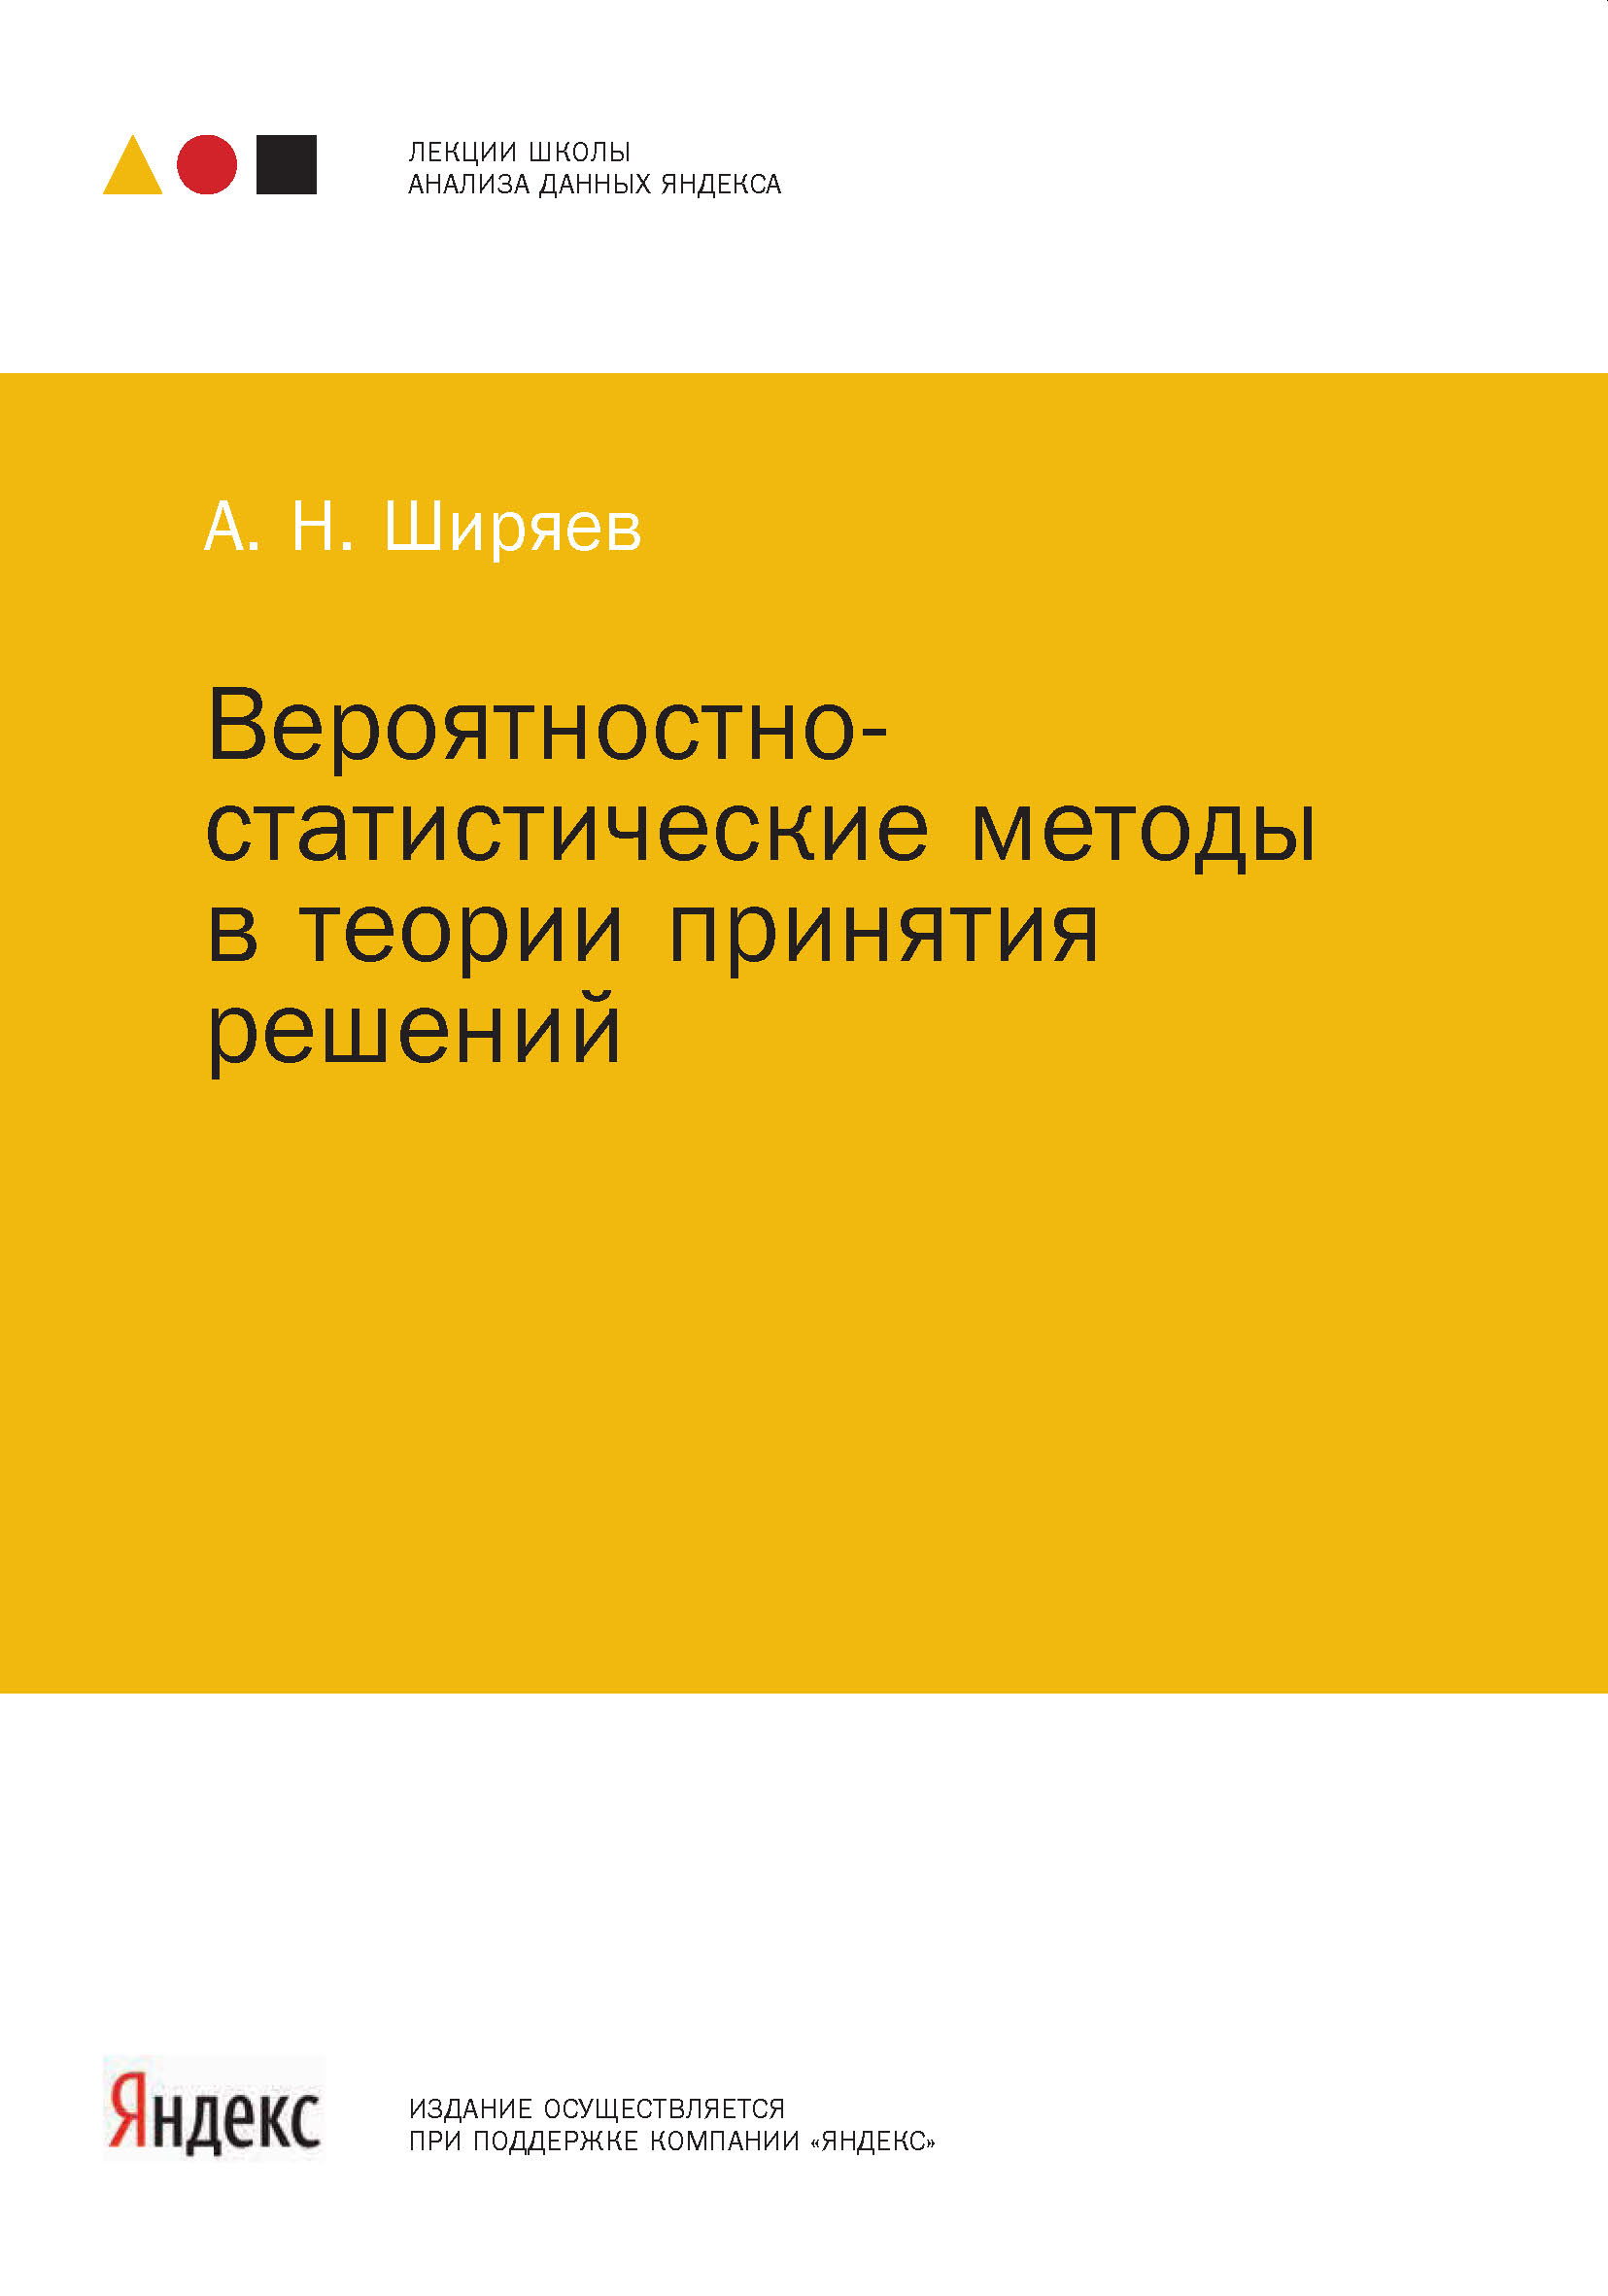 А. Н. Ширяев Вероятностно-статистические методы в теории принятия решений свеча honda lead 90